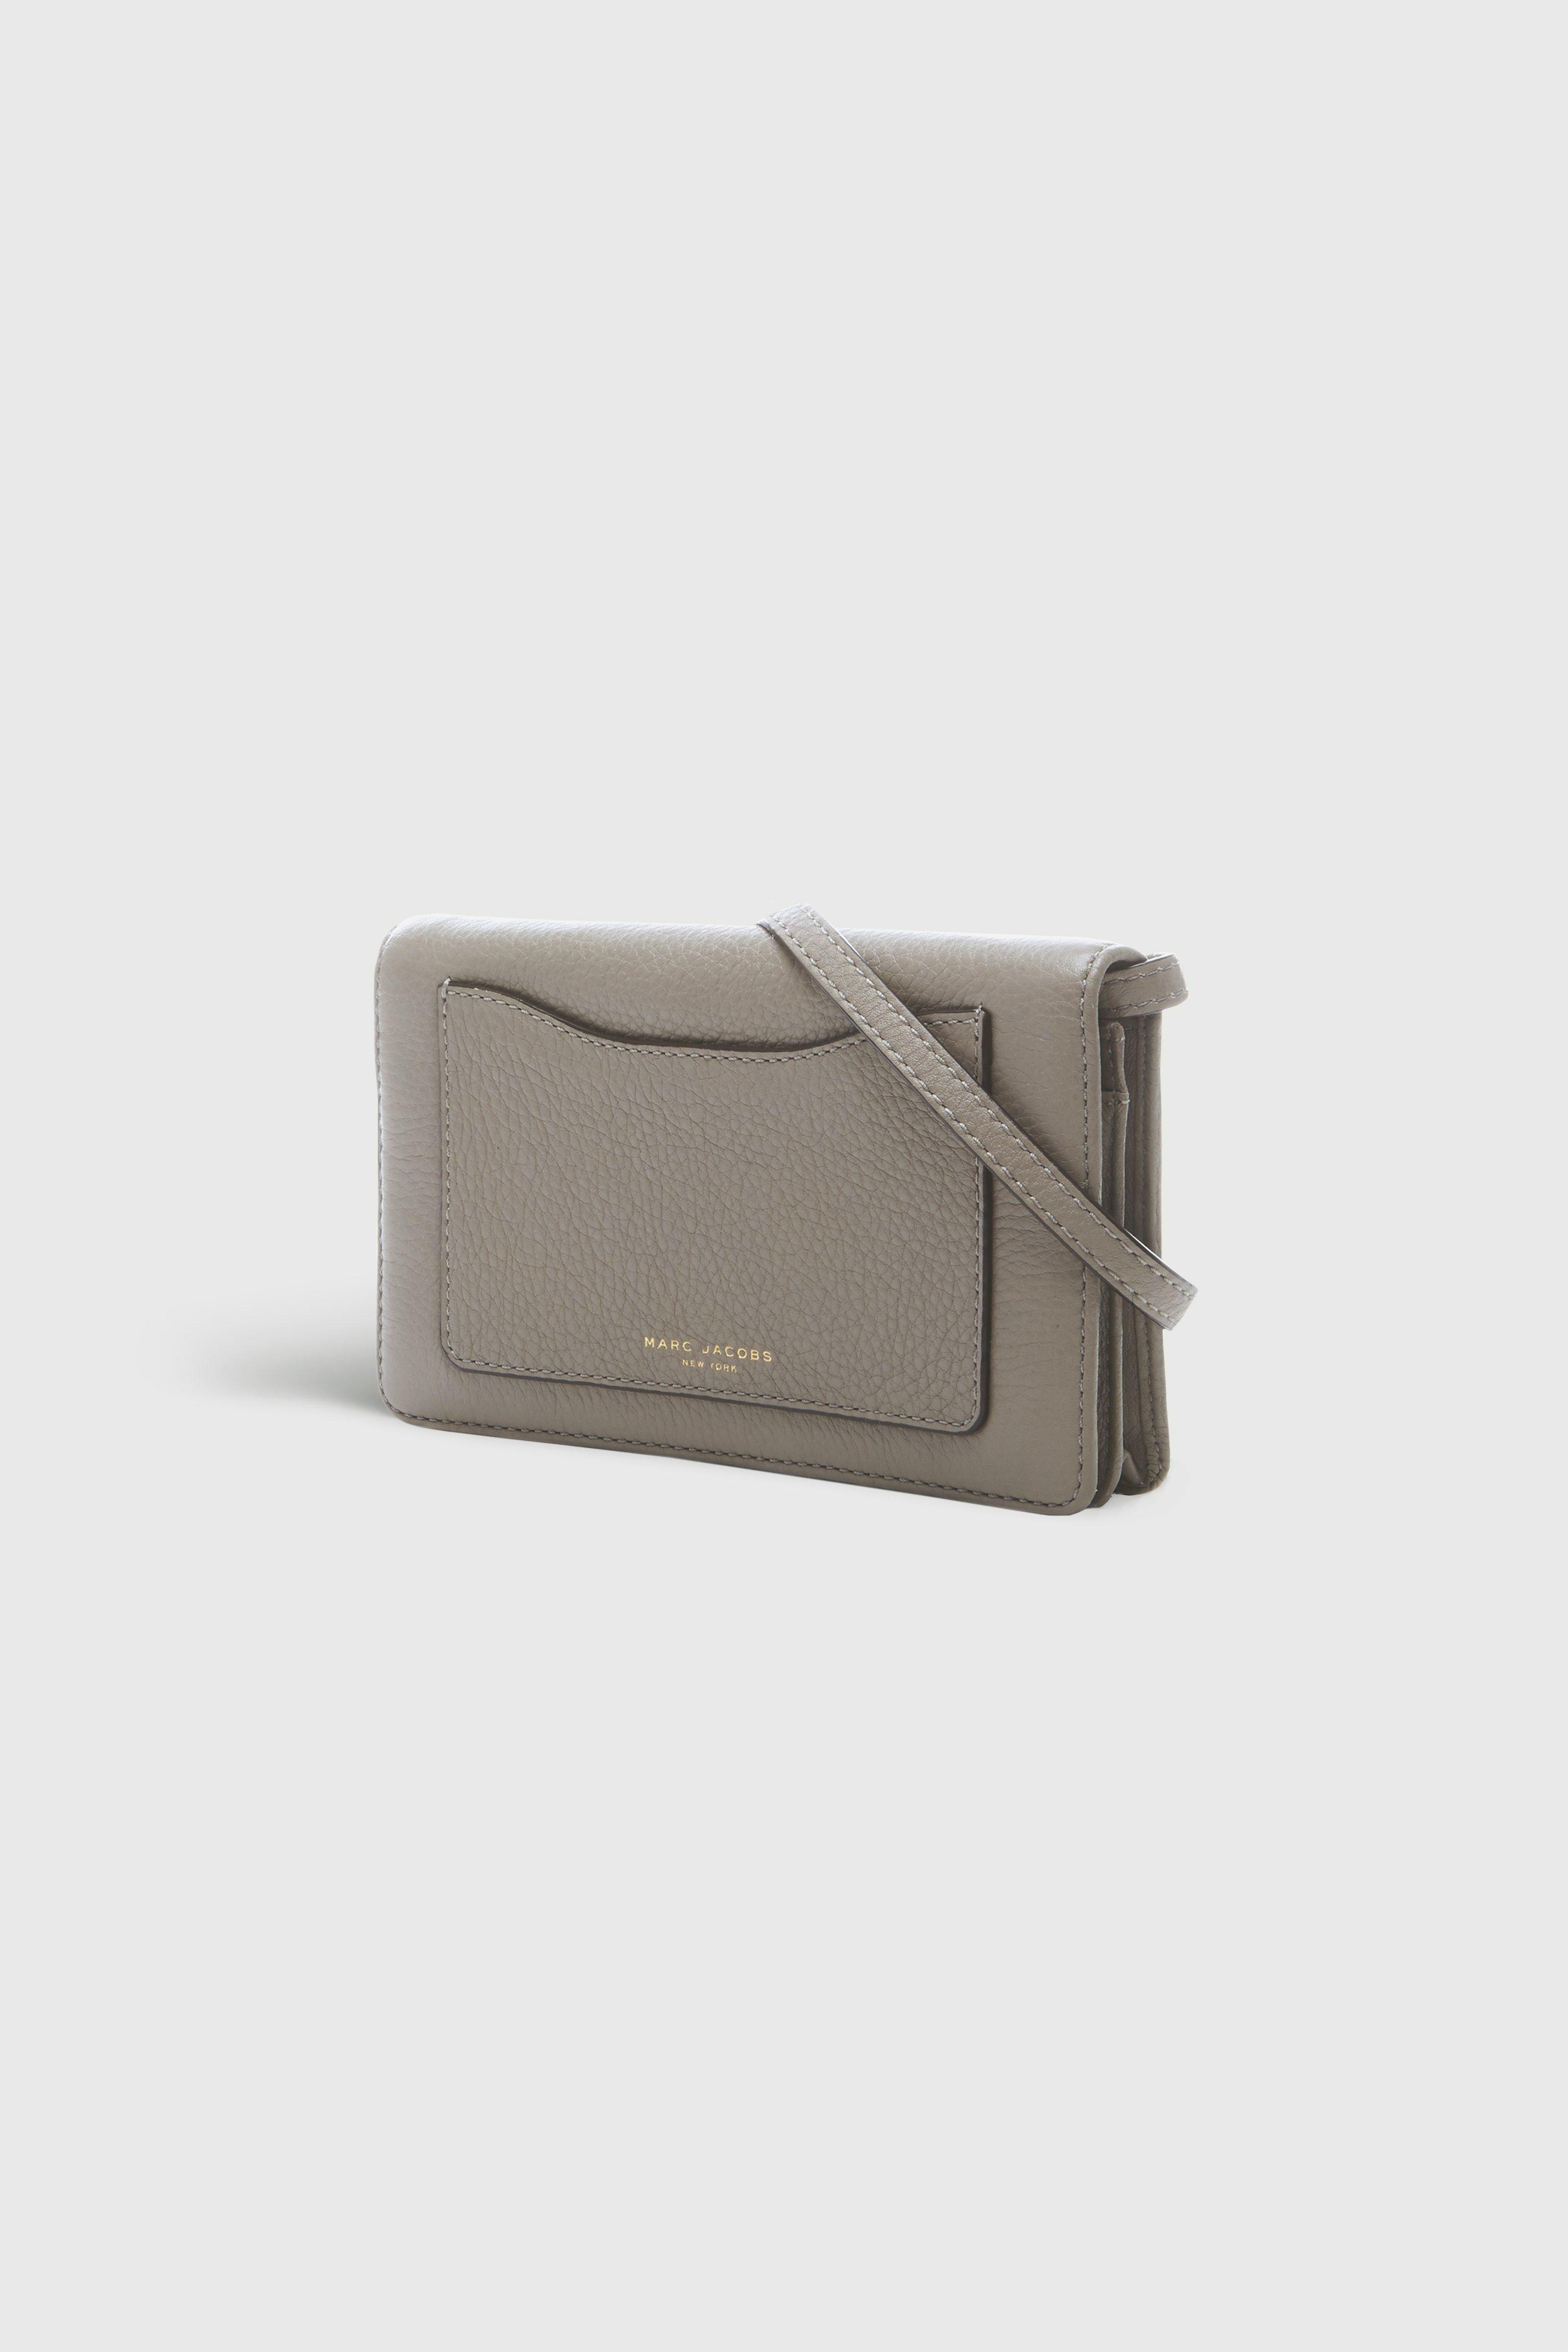 Marc Jacobs 29 - Recruit Wallet Leather Strap - Mink